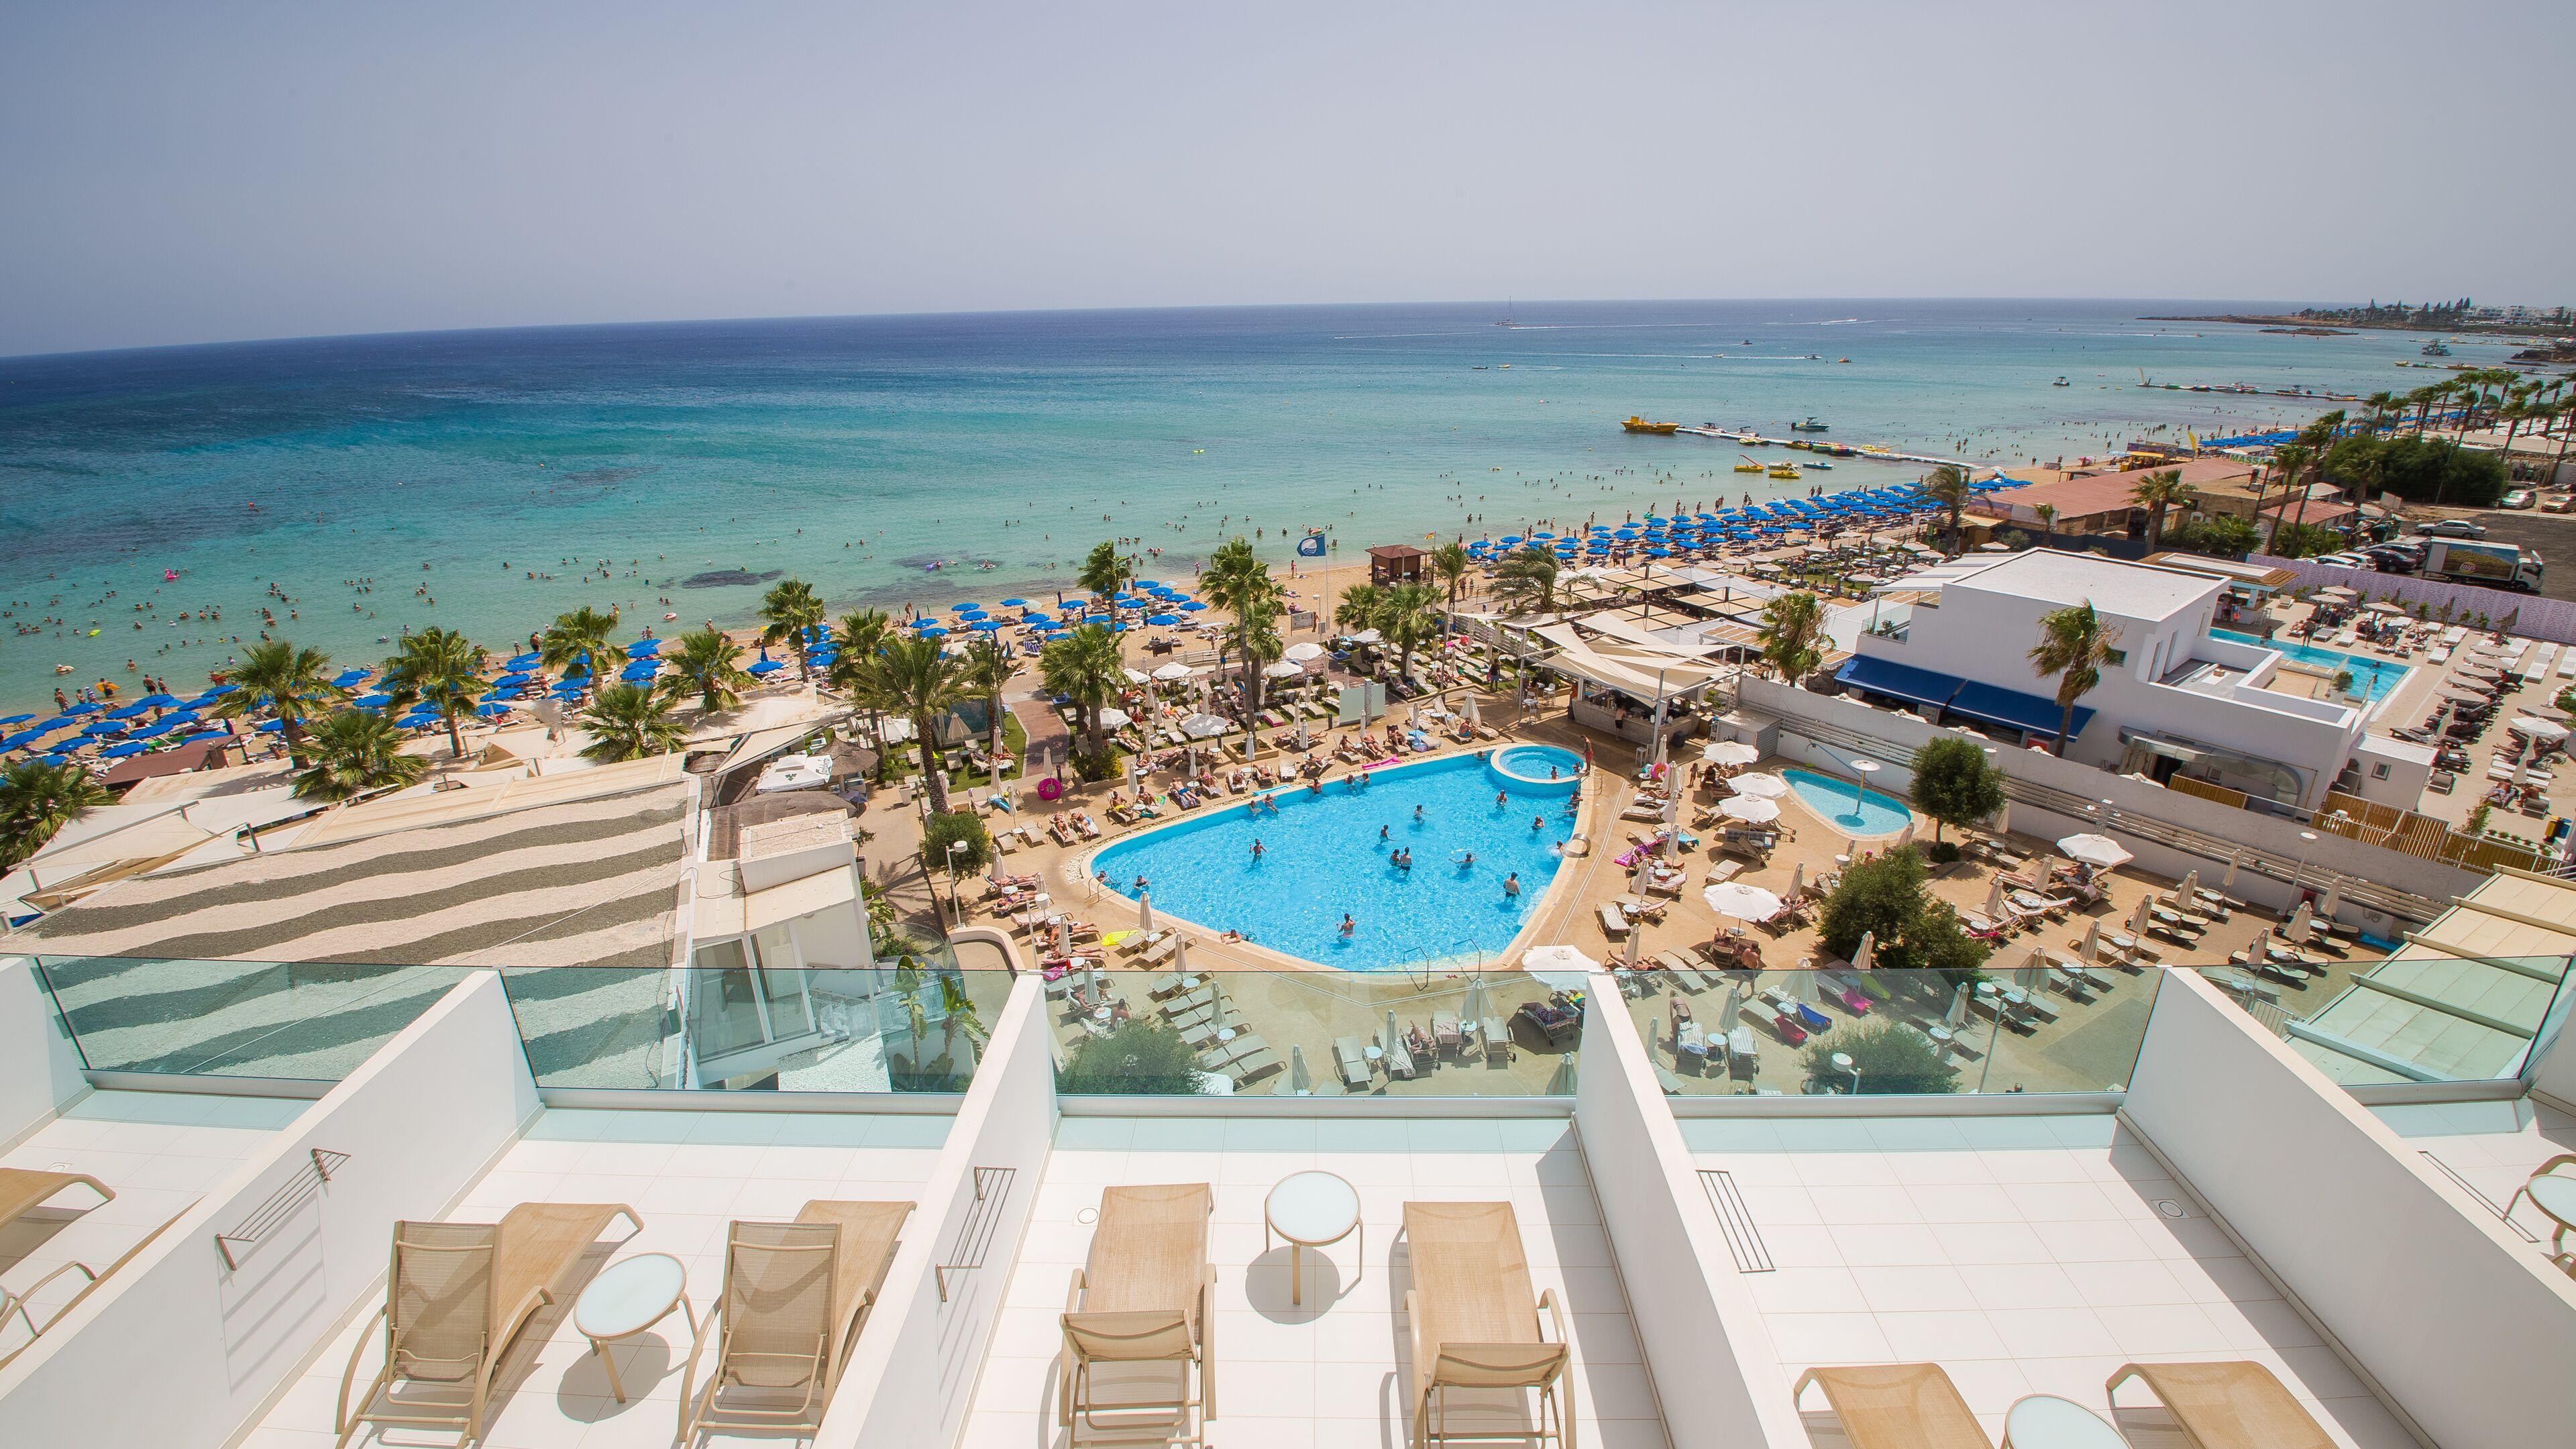 Courtesy of Vrissaki Beach Hotel / Expedia